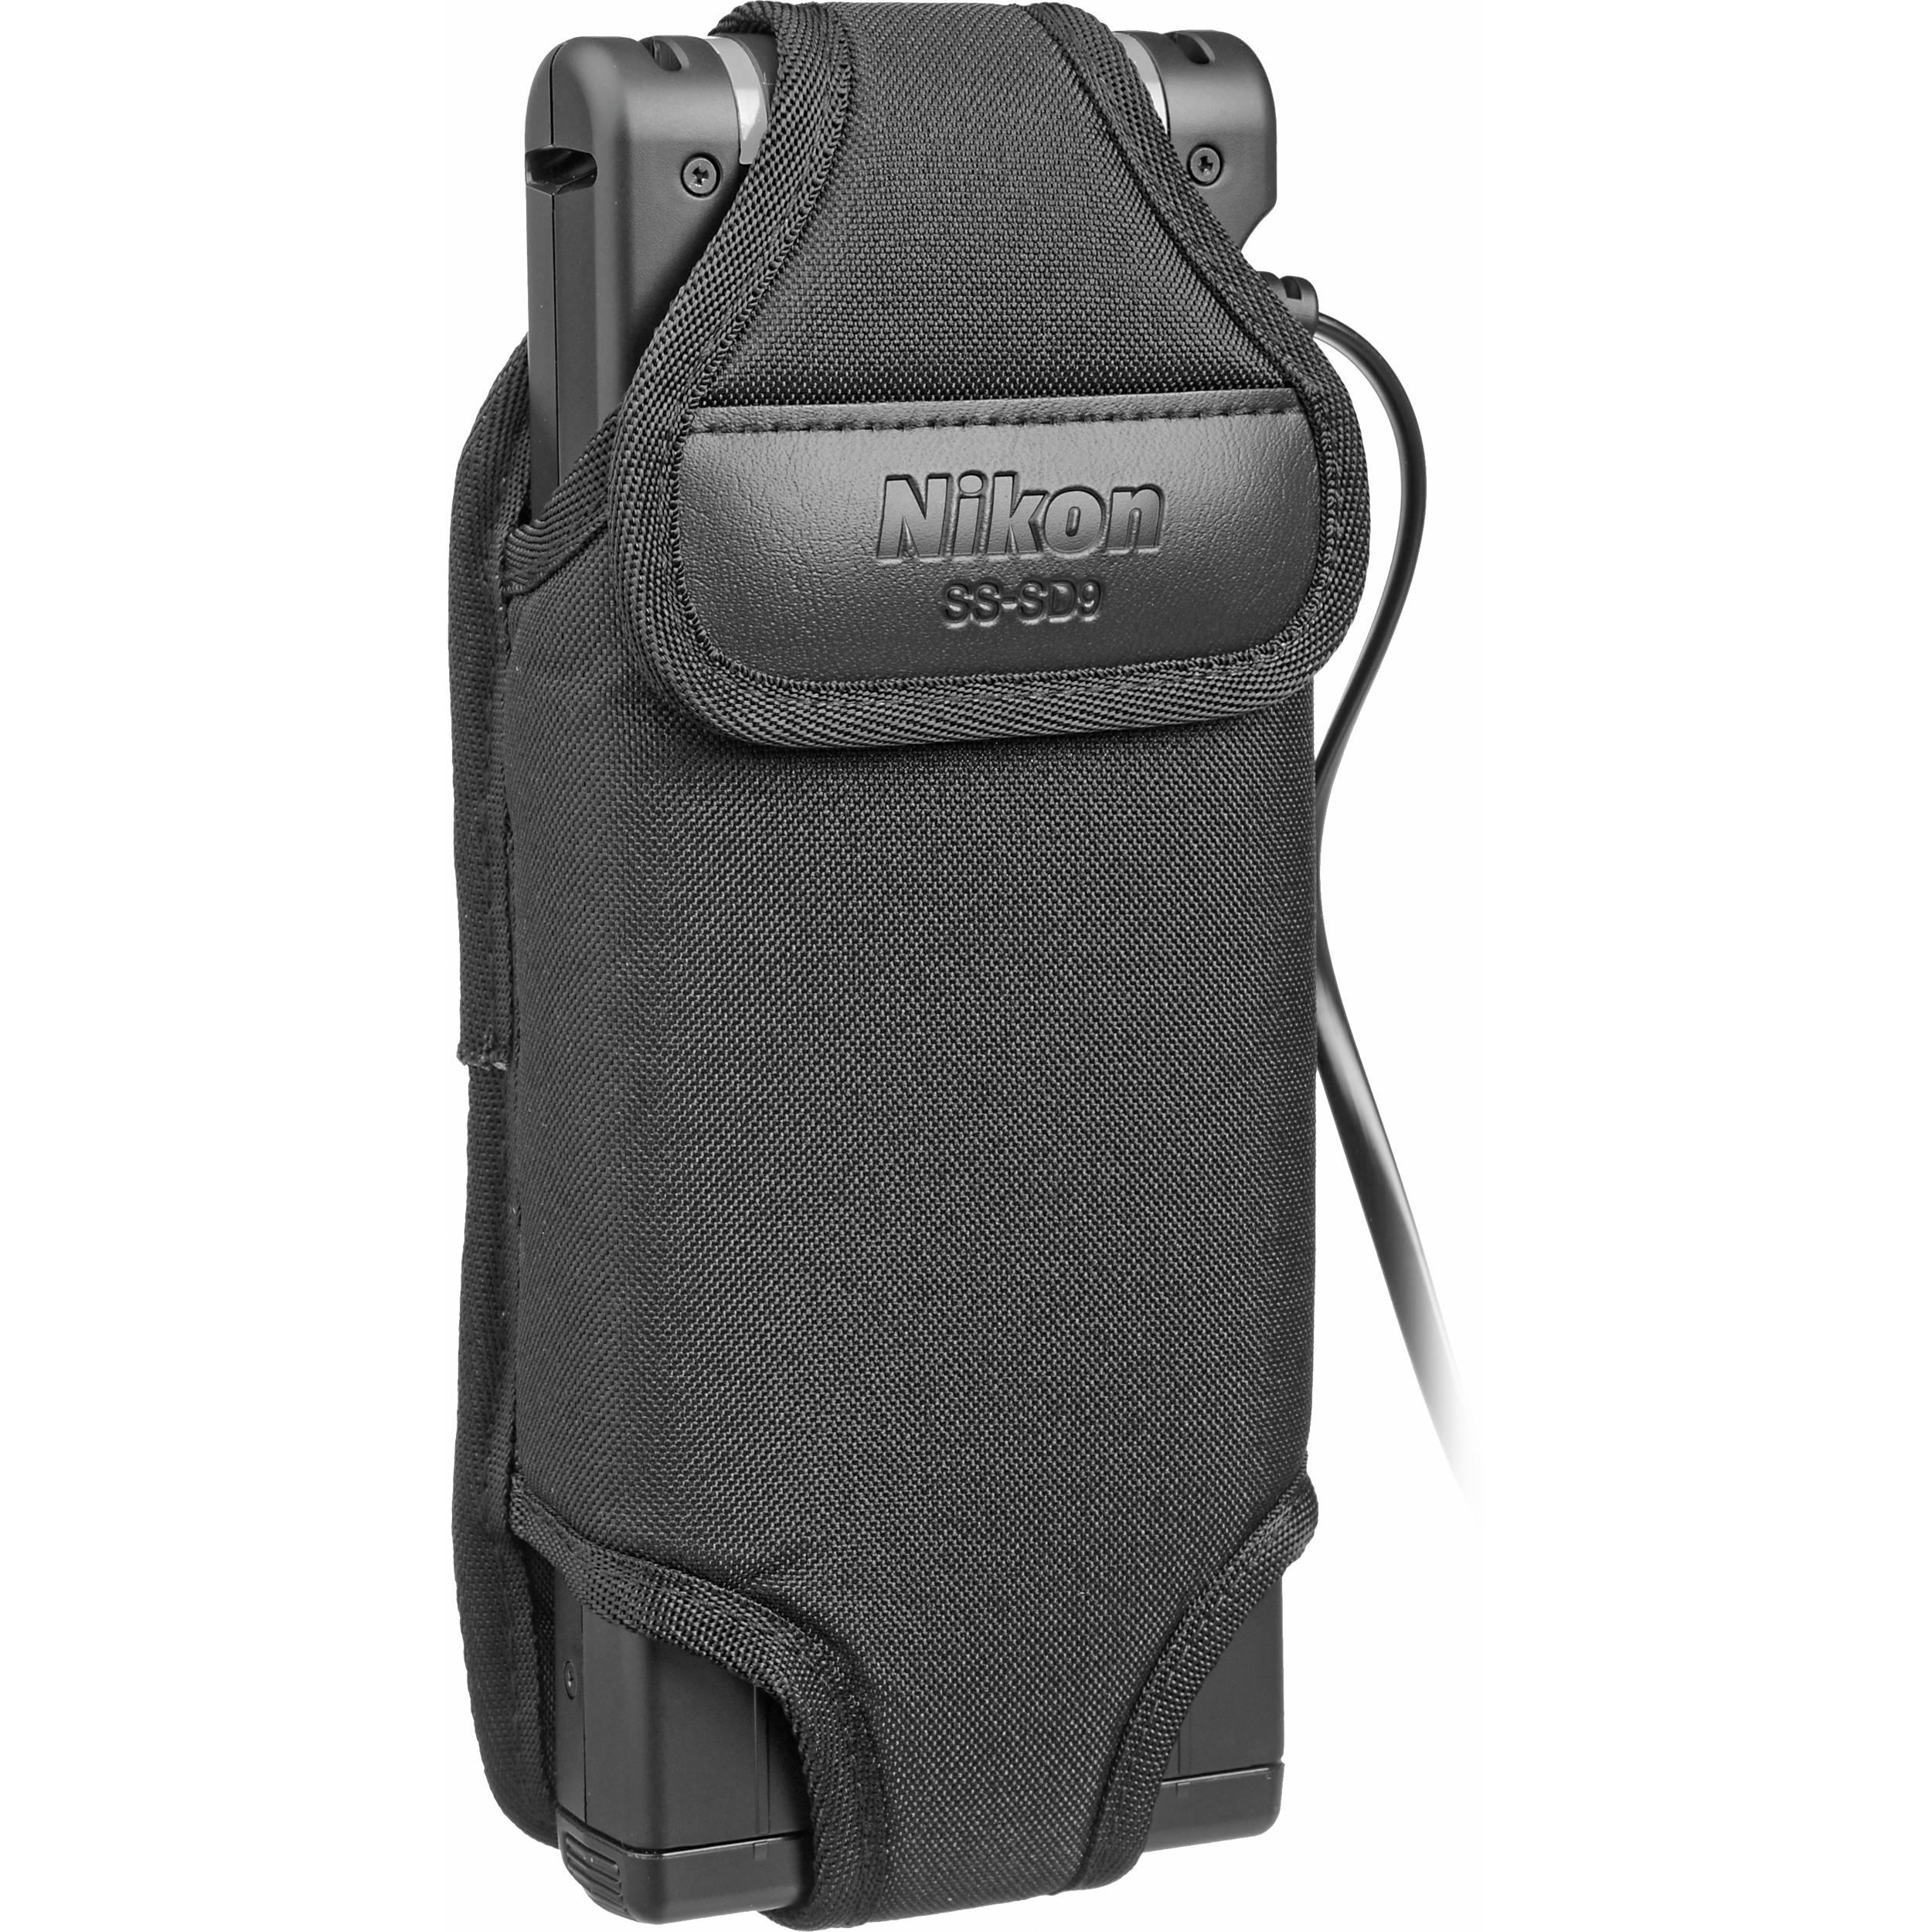 Nikon sb 910 bh photo video nikon sd 9 battery pack baditri Images